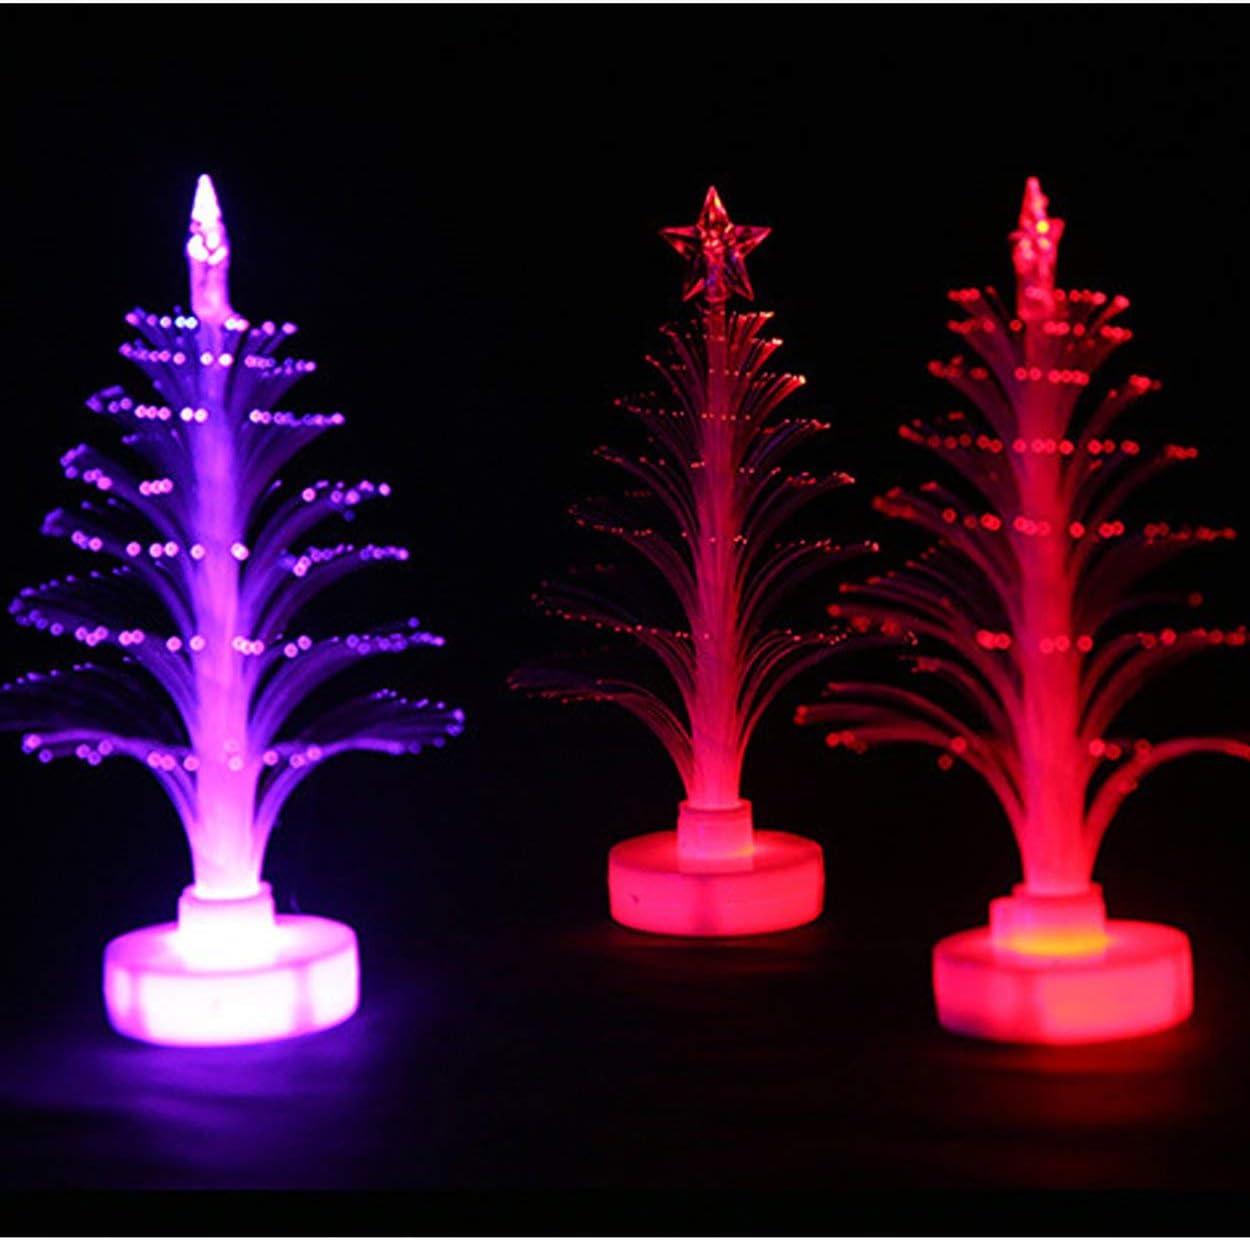 Lodenlli Romantic Gift Colorful Fiber Optic Christmas Creative Colorful Flash Christmas Tree Night Light